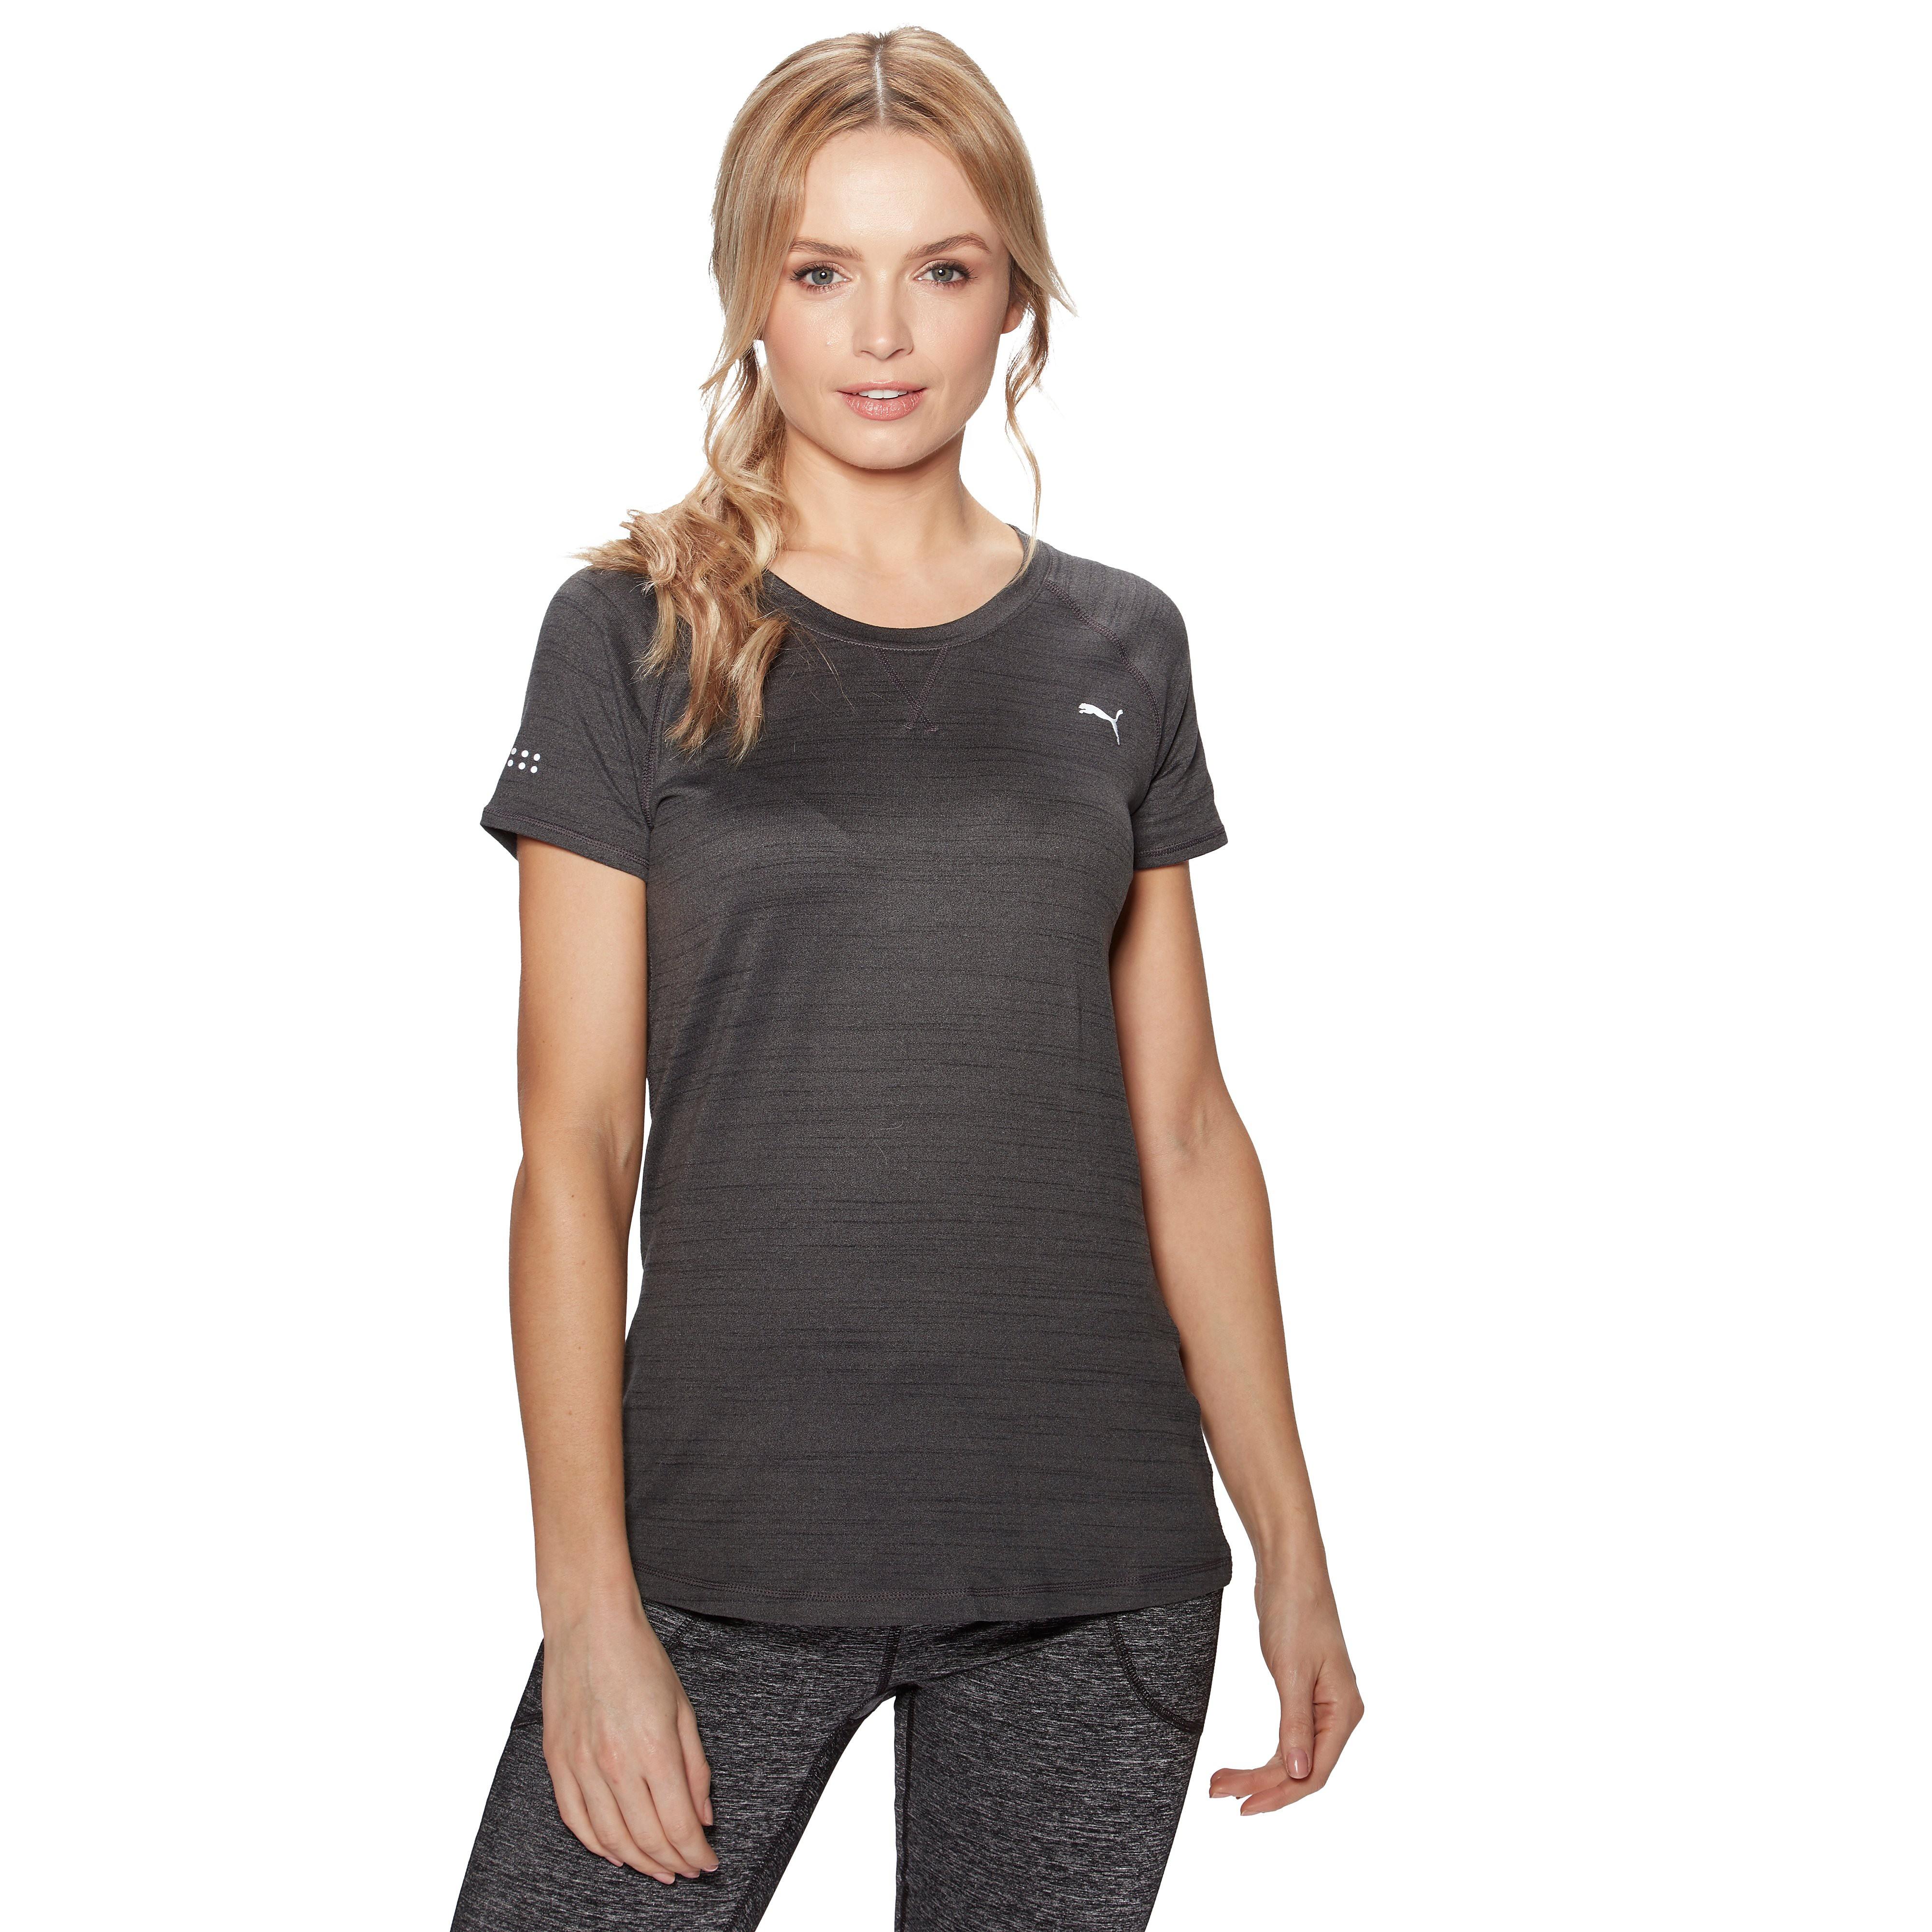 PUMA Epic Women's Training T-Shirt